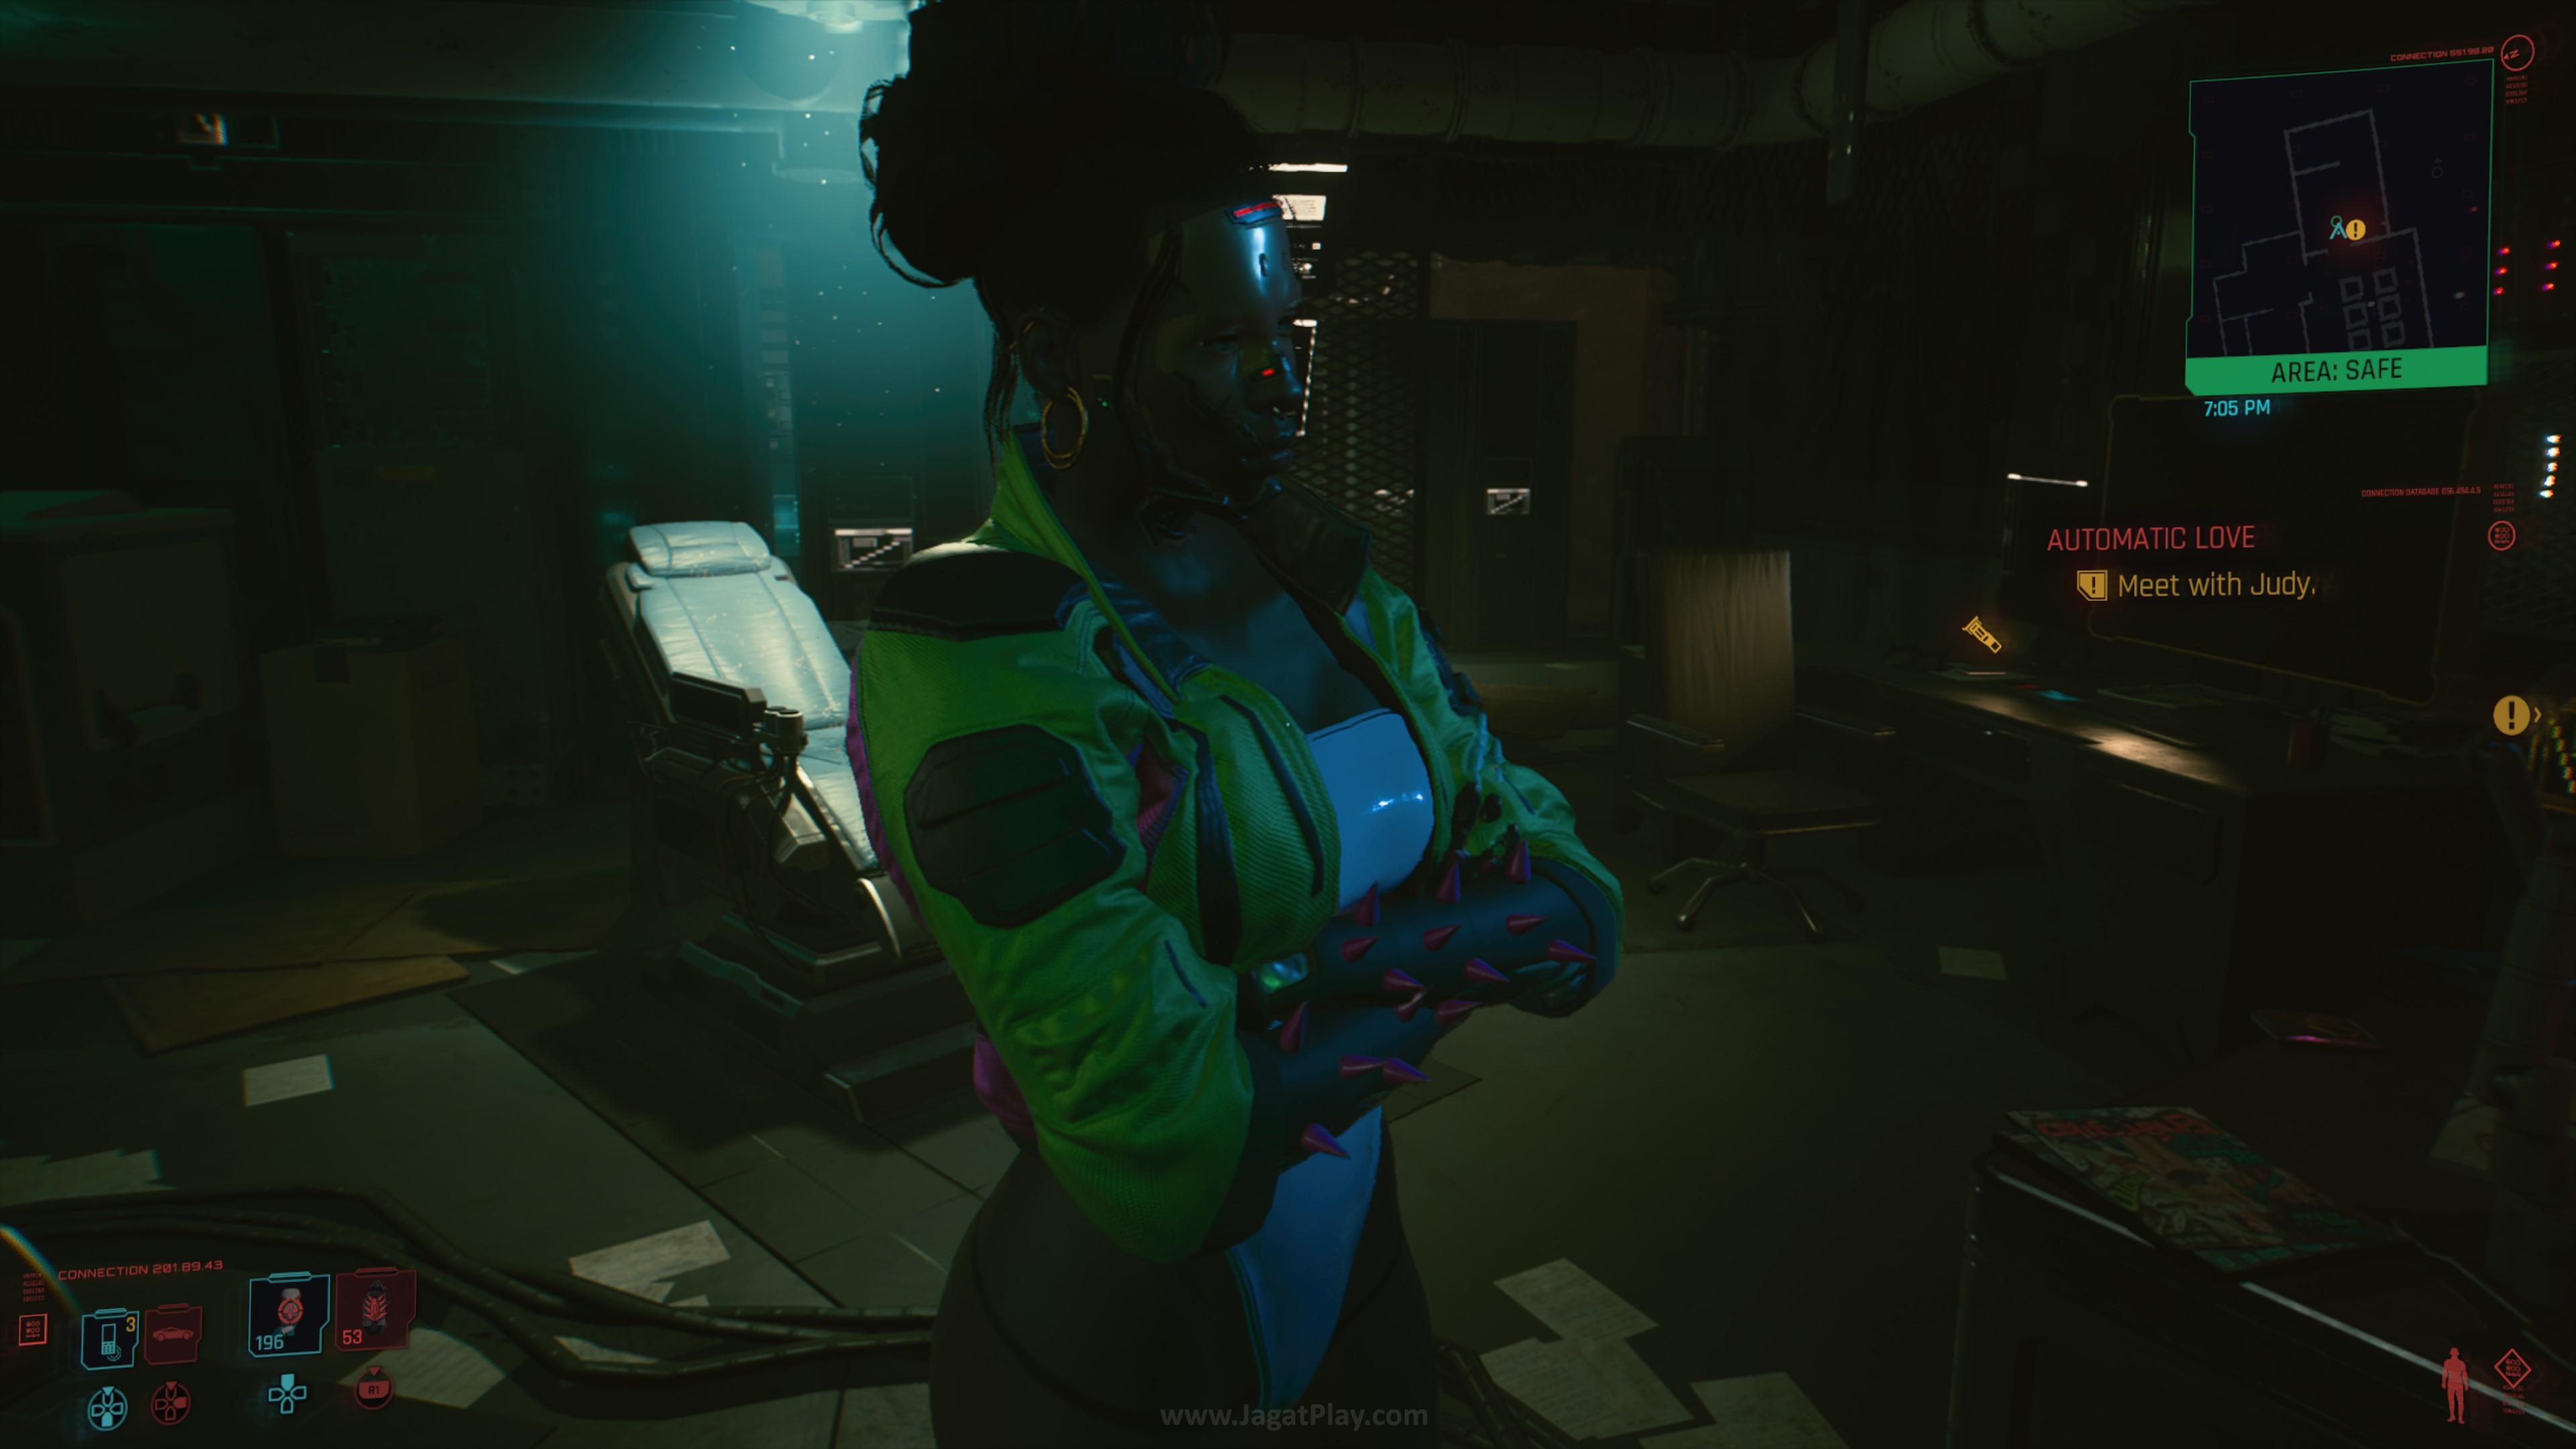 cyberpunk 2077 jagatplay part 1 81 1